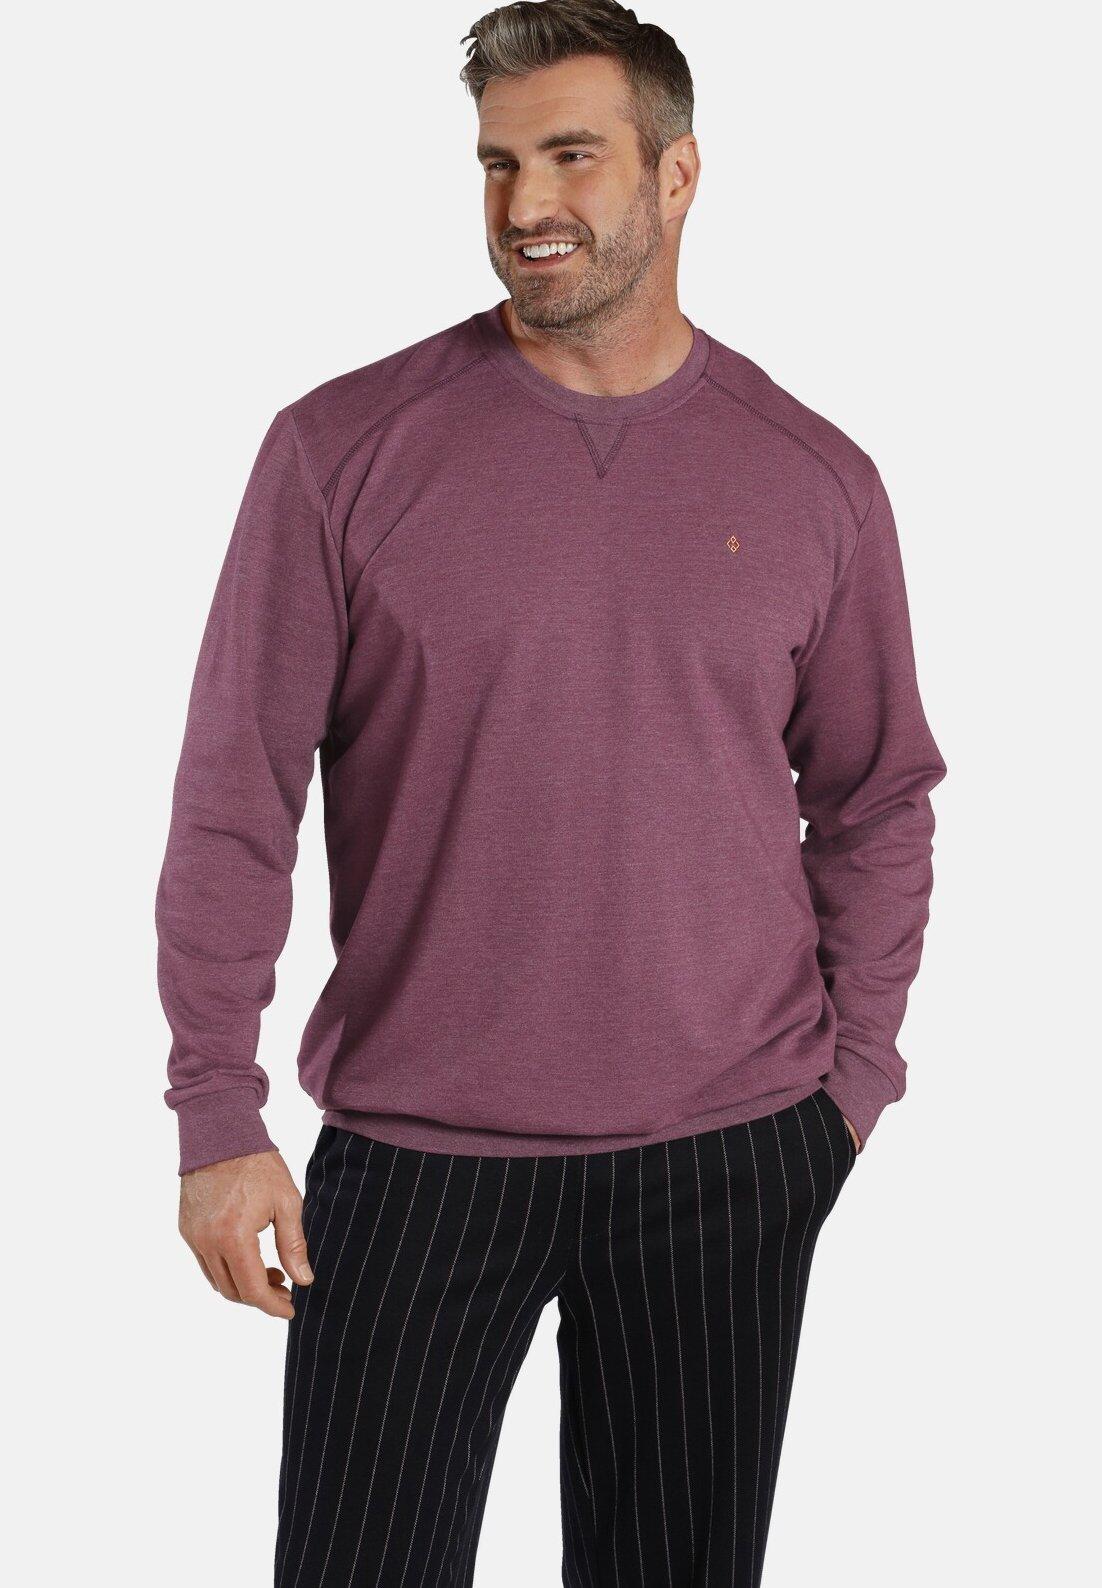 Homme EARL LINAS - Sweatshirt